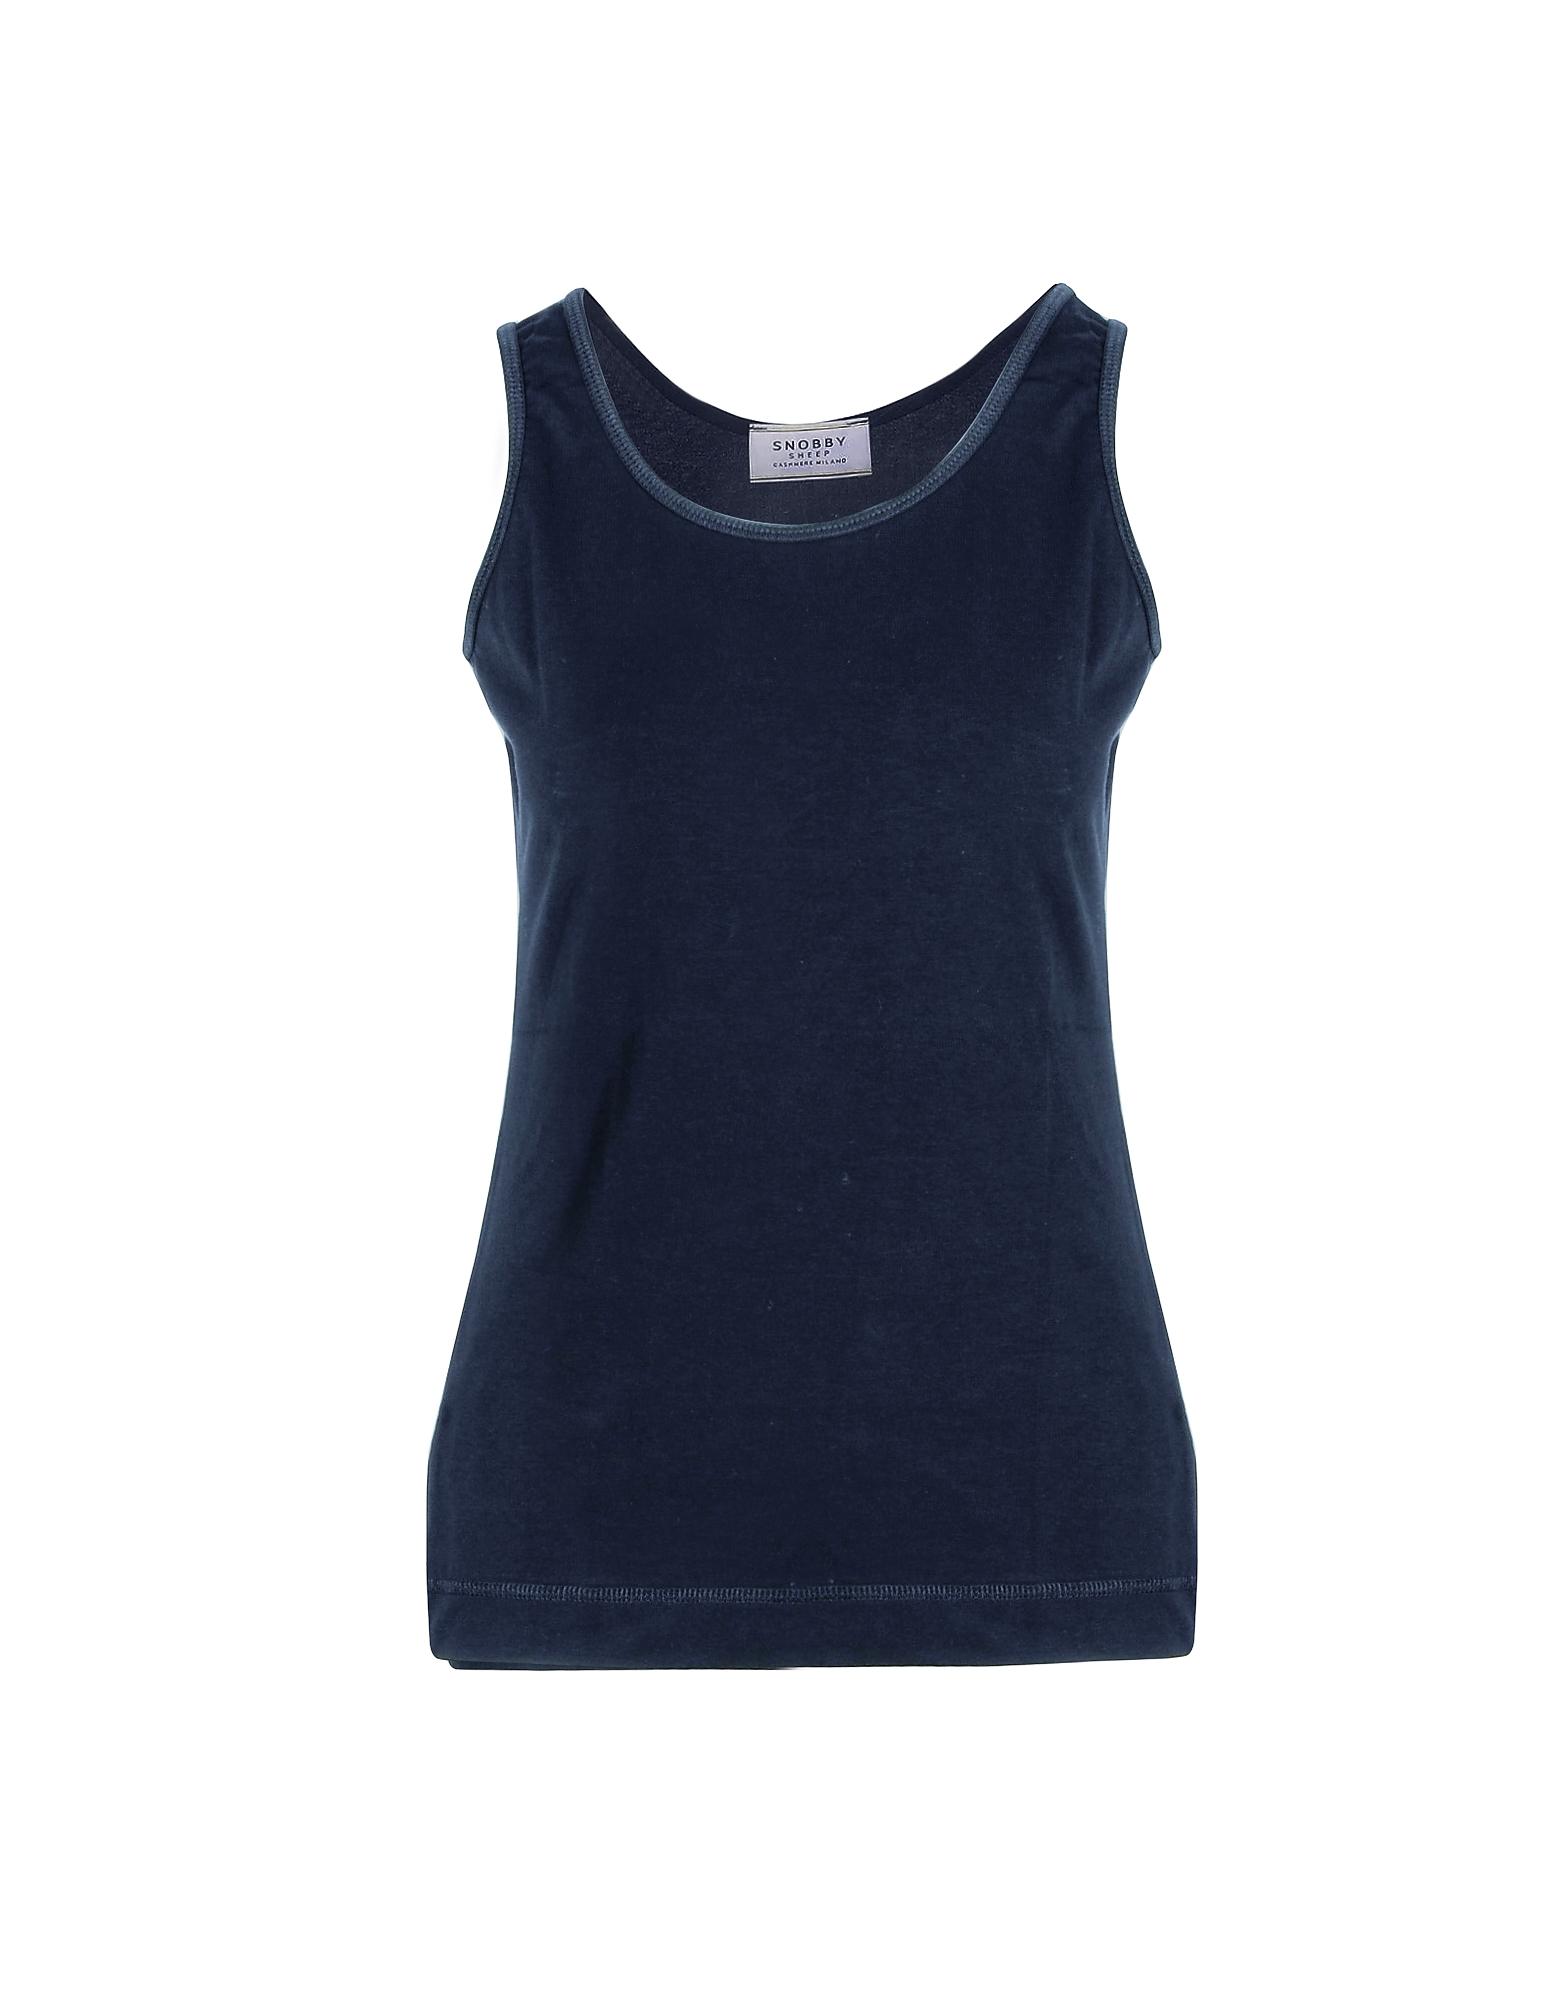 SNOBBY SHEEP Designer T-Shirts & Tops, Blue Cotton Women's Tank Top